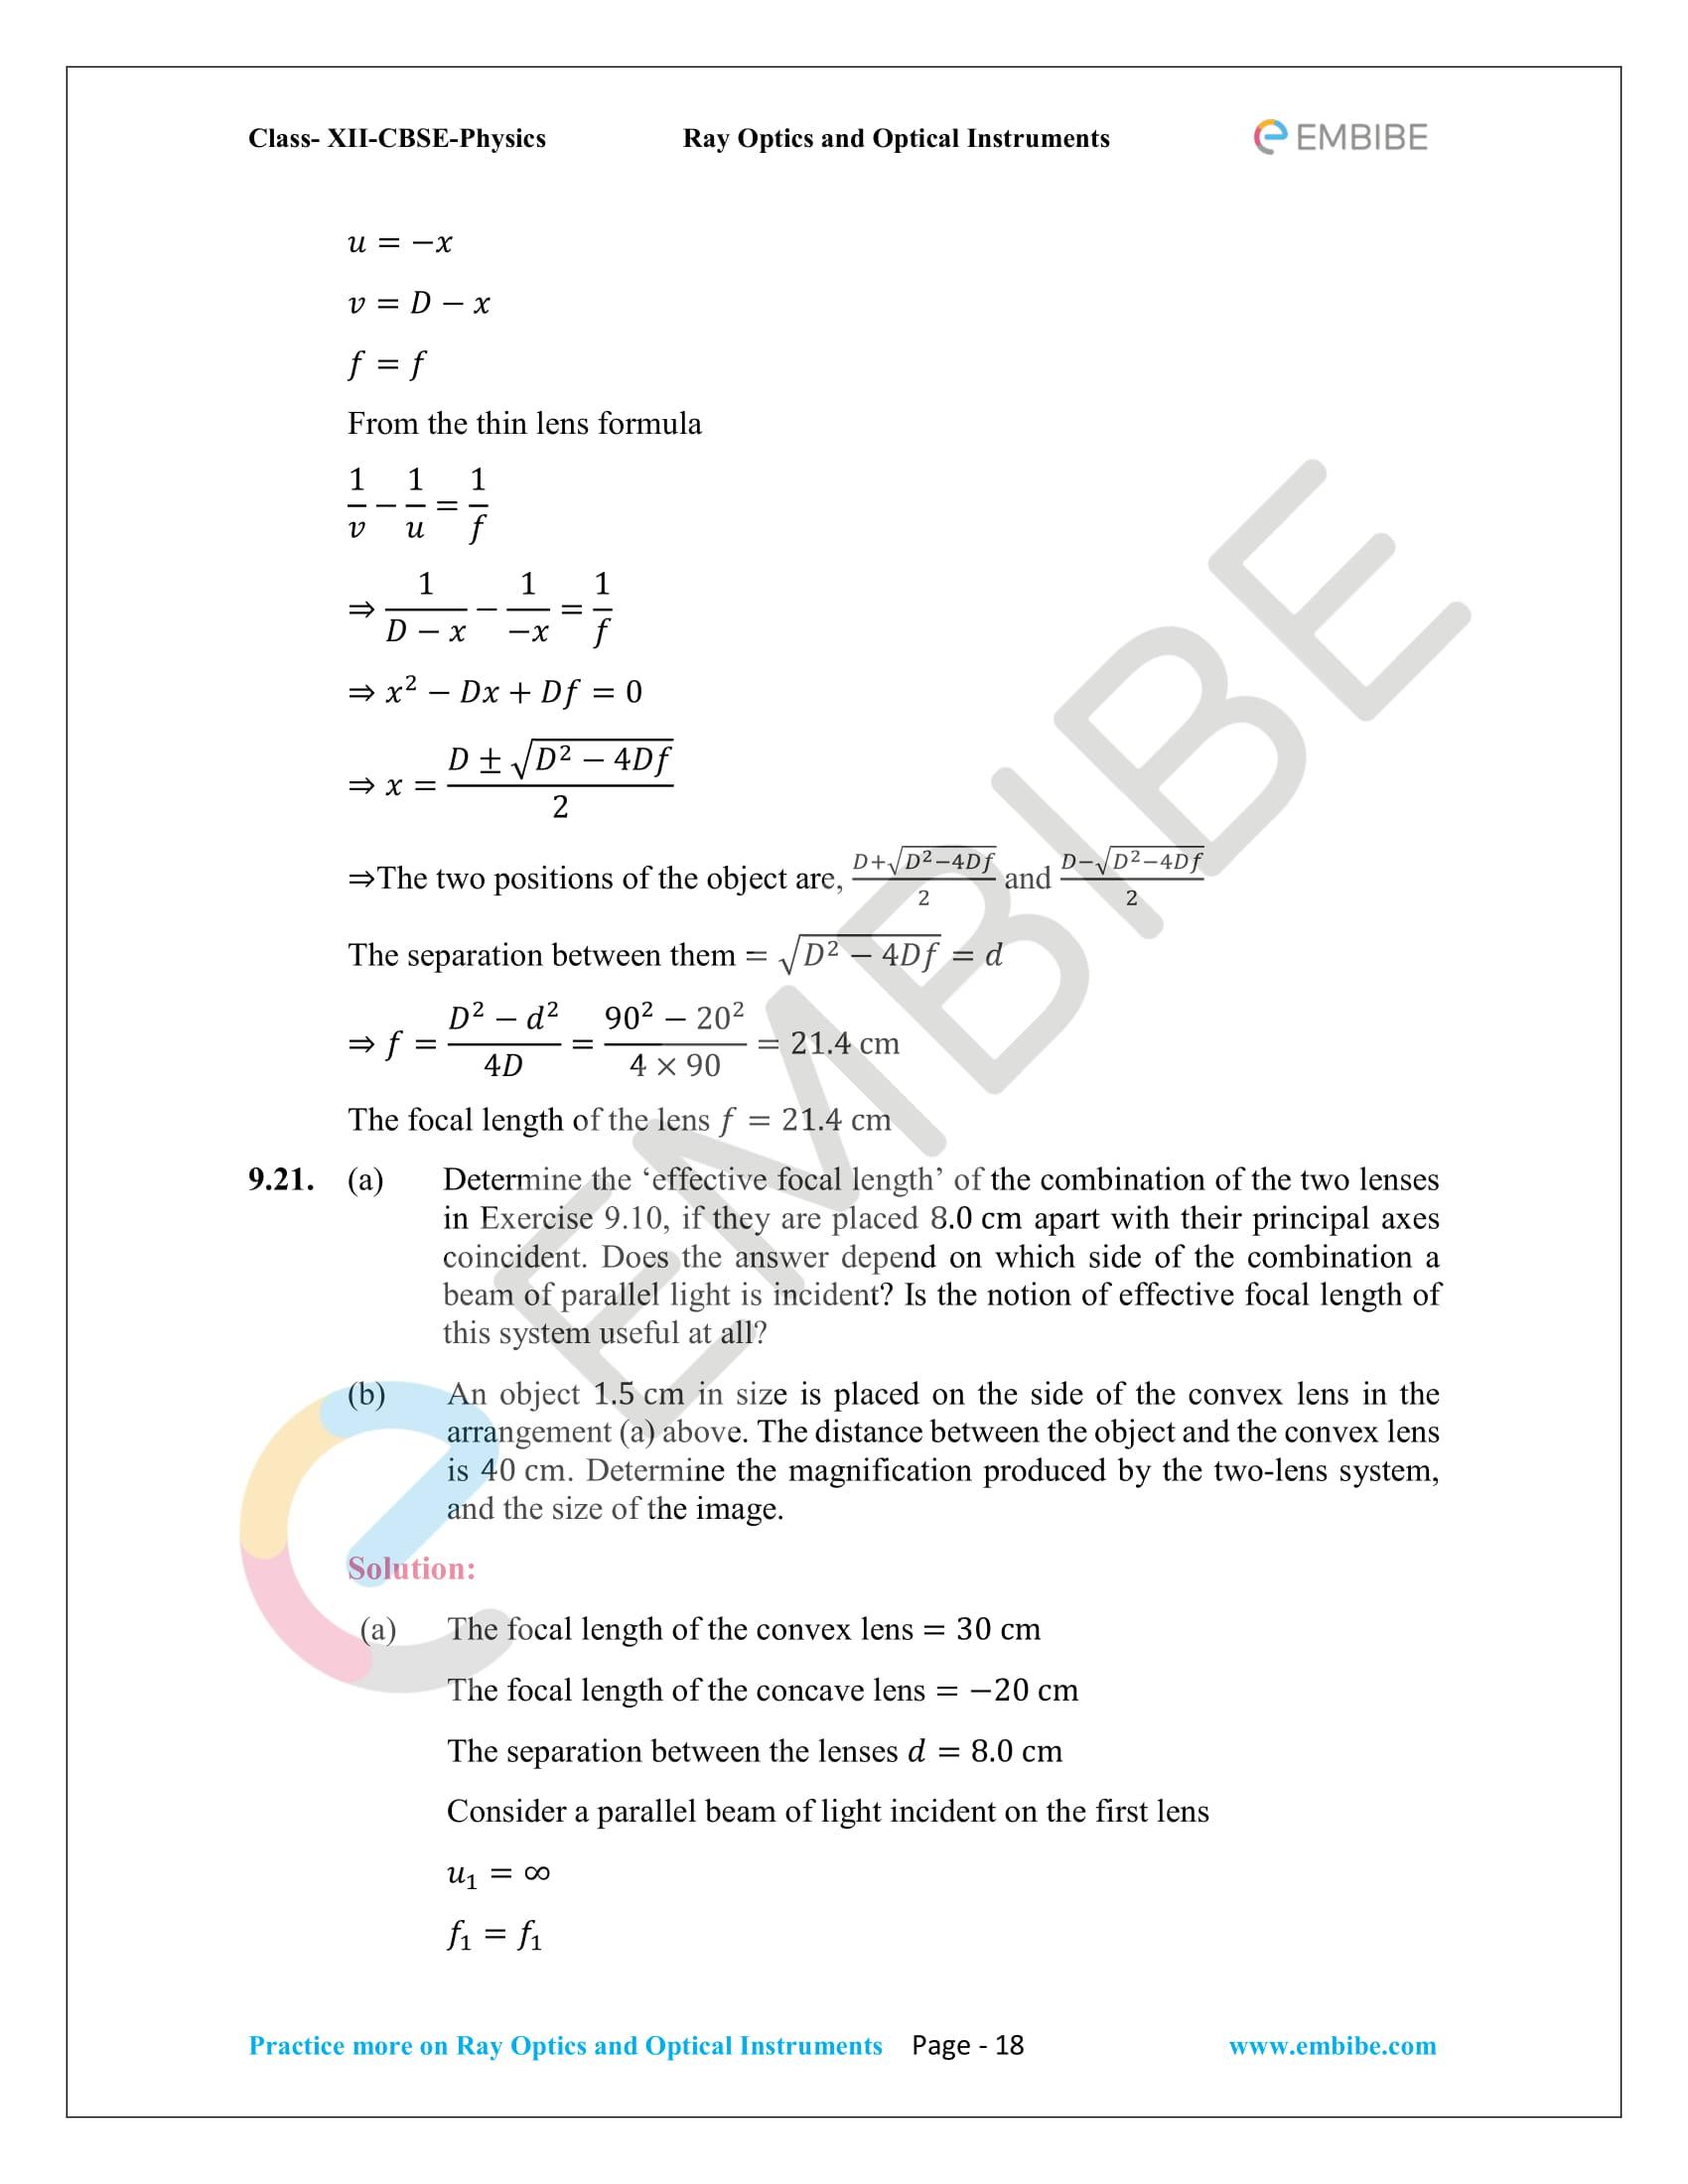 NCERT_Grade 12_Physics_Ch_09_Ray Optics-18